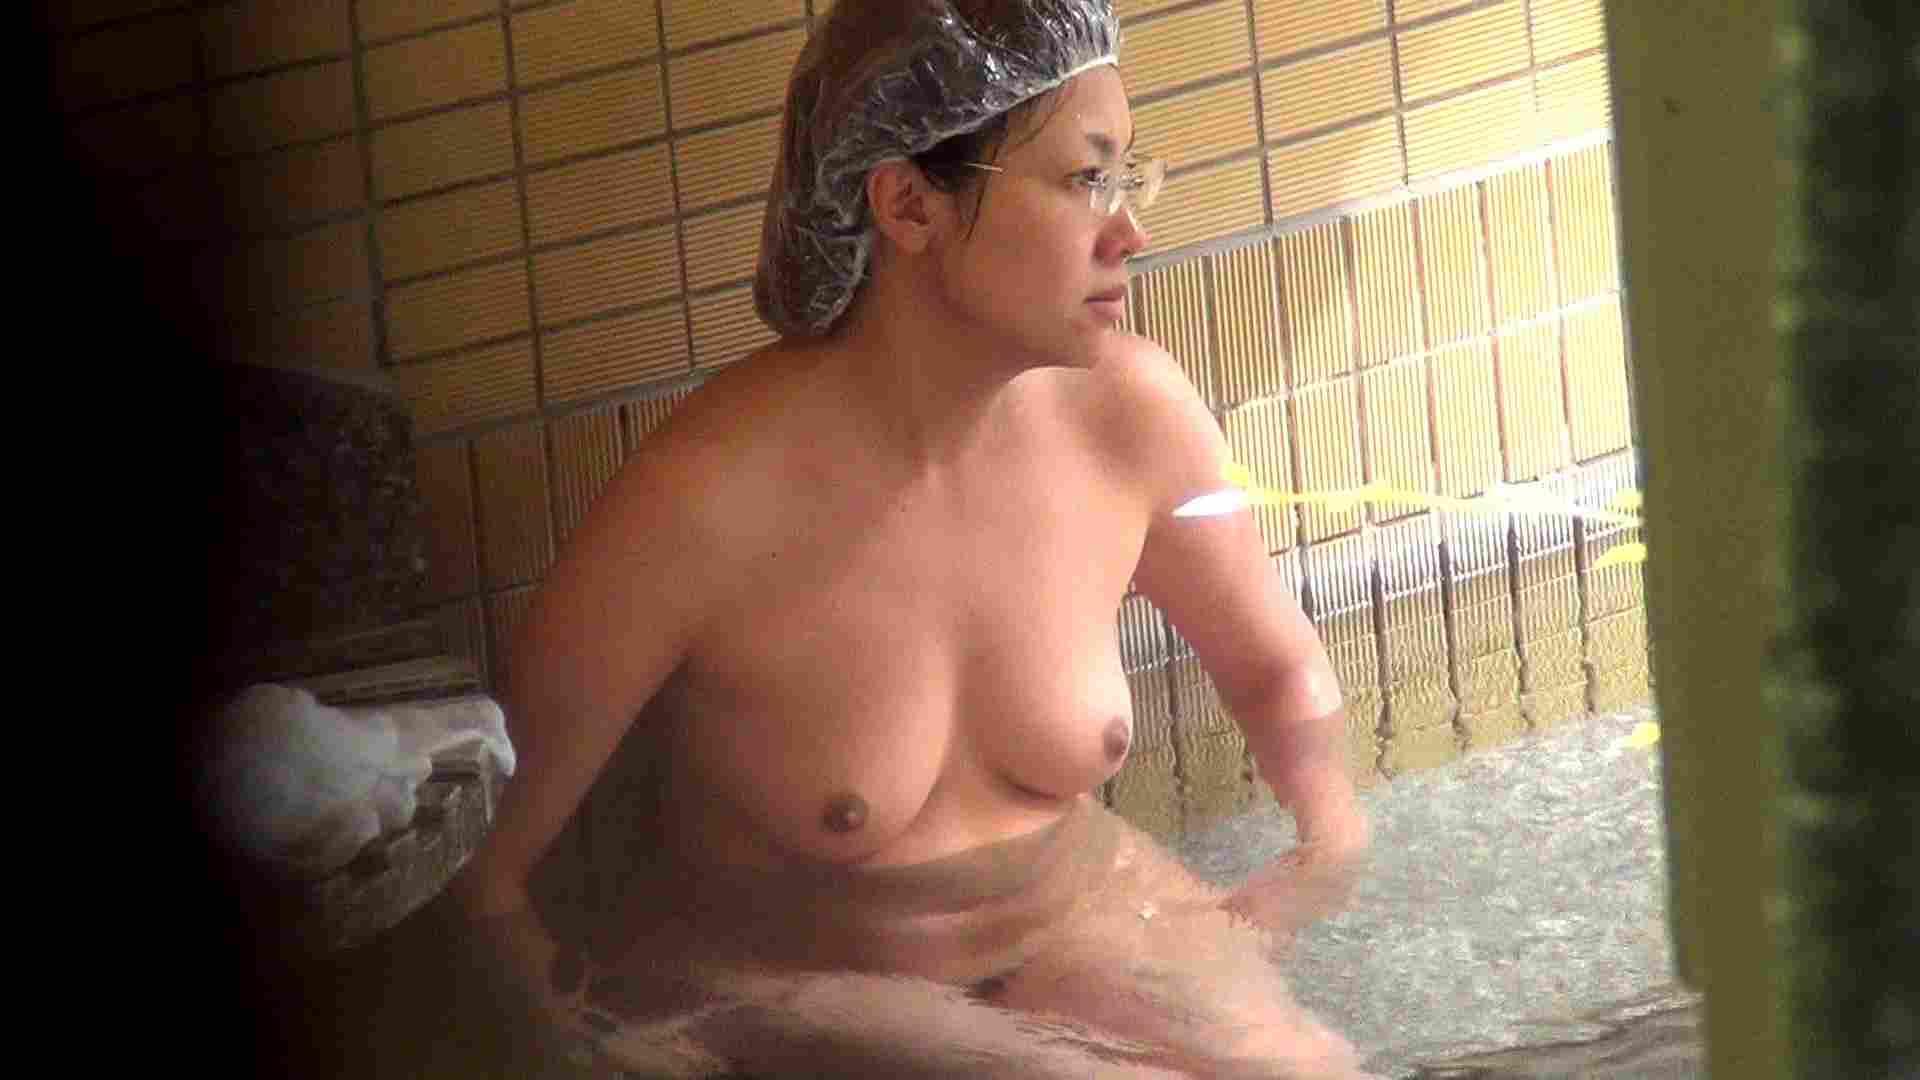 Aquaな露天風呂Vol.280 露天 戯れ無修正画像 91画像 86